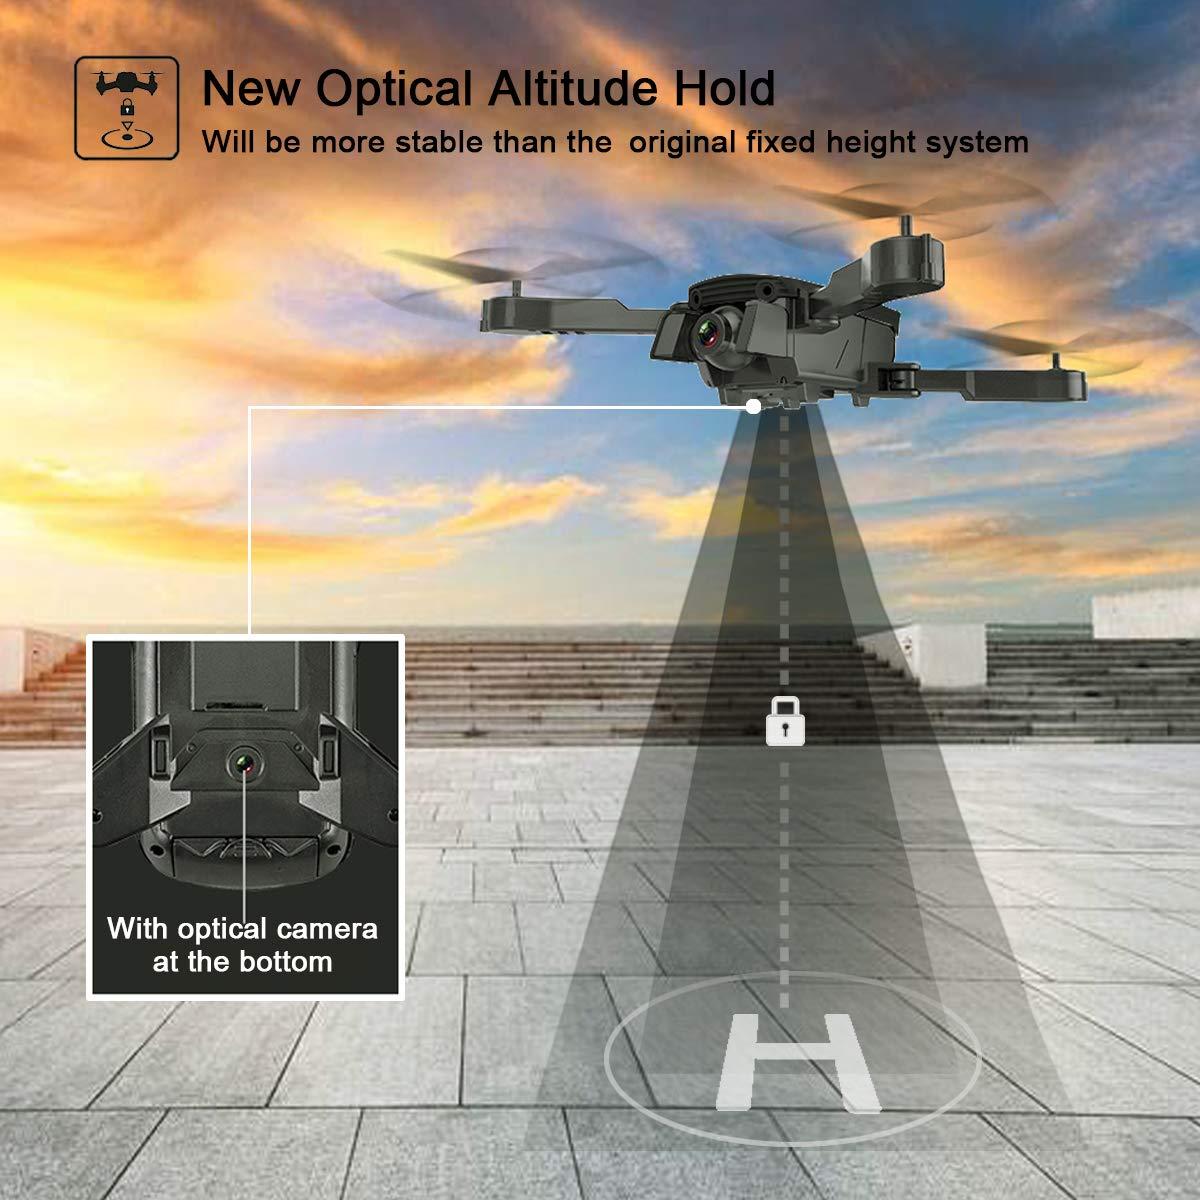 Mixi Drone Optical altitude hold